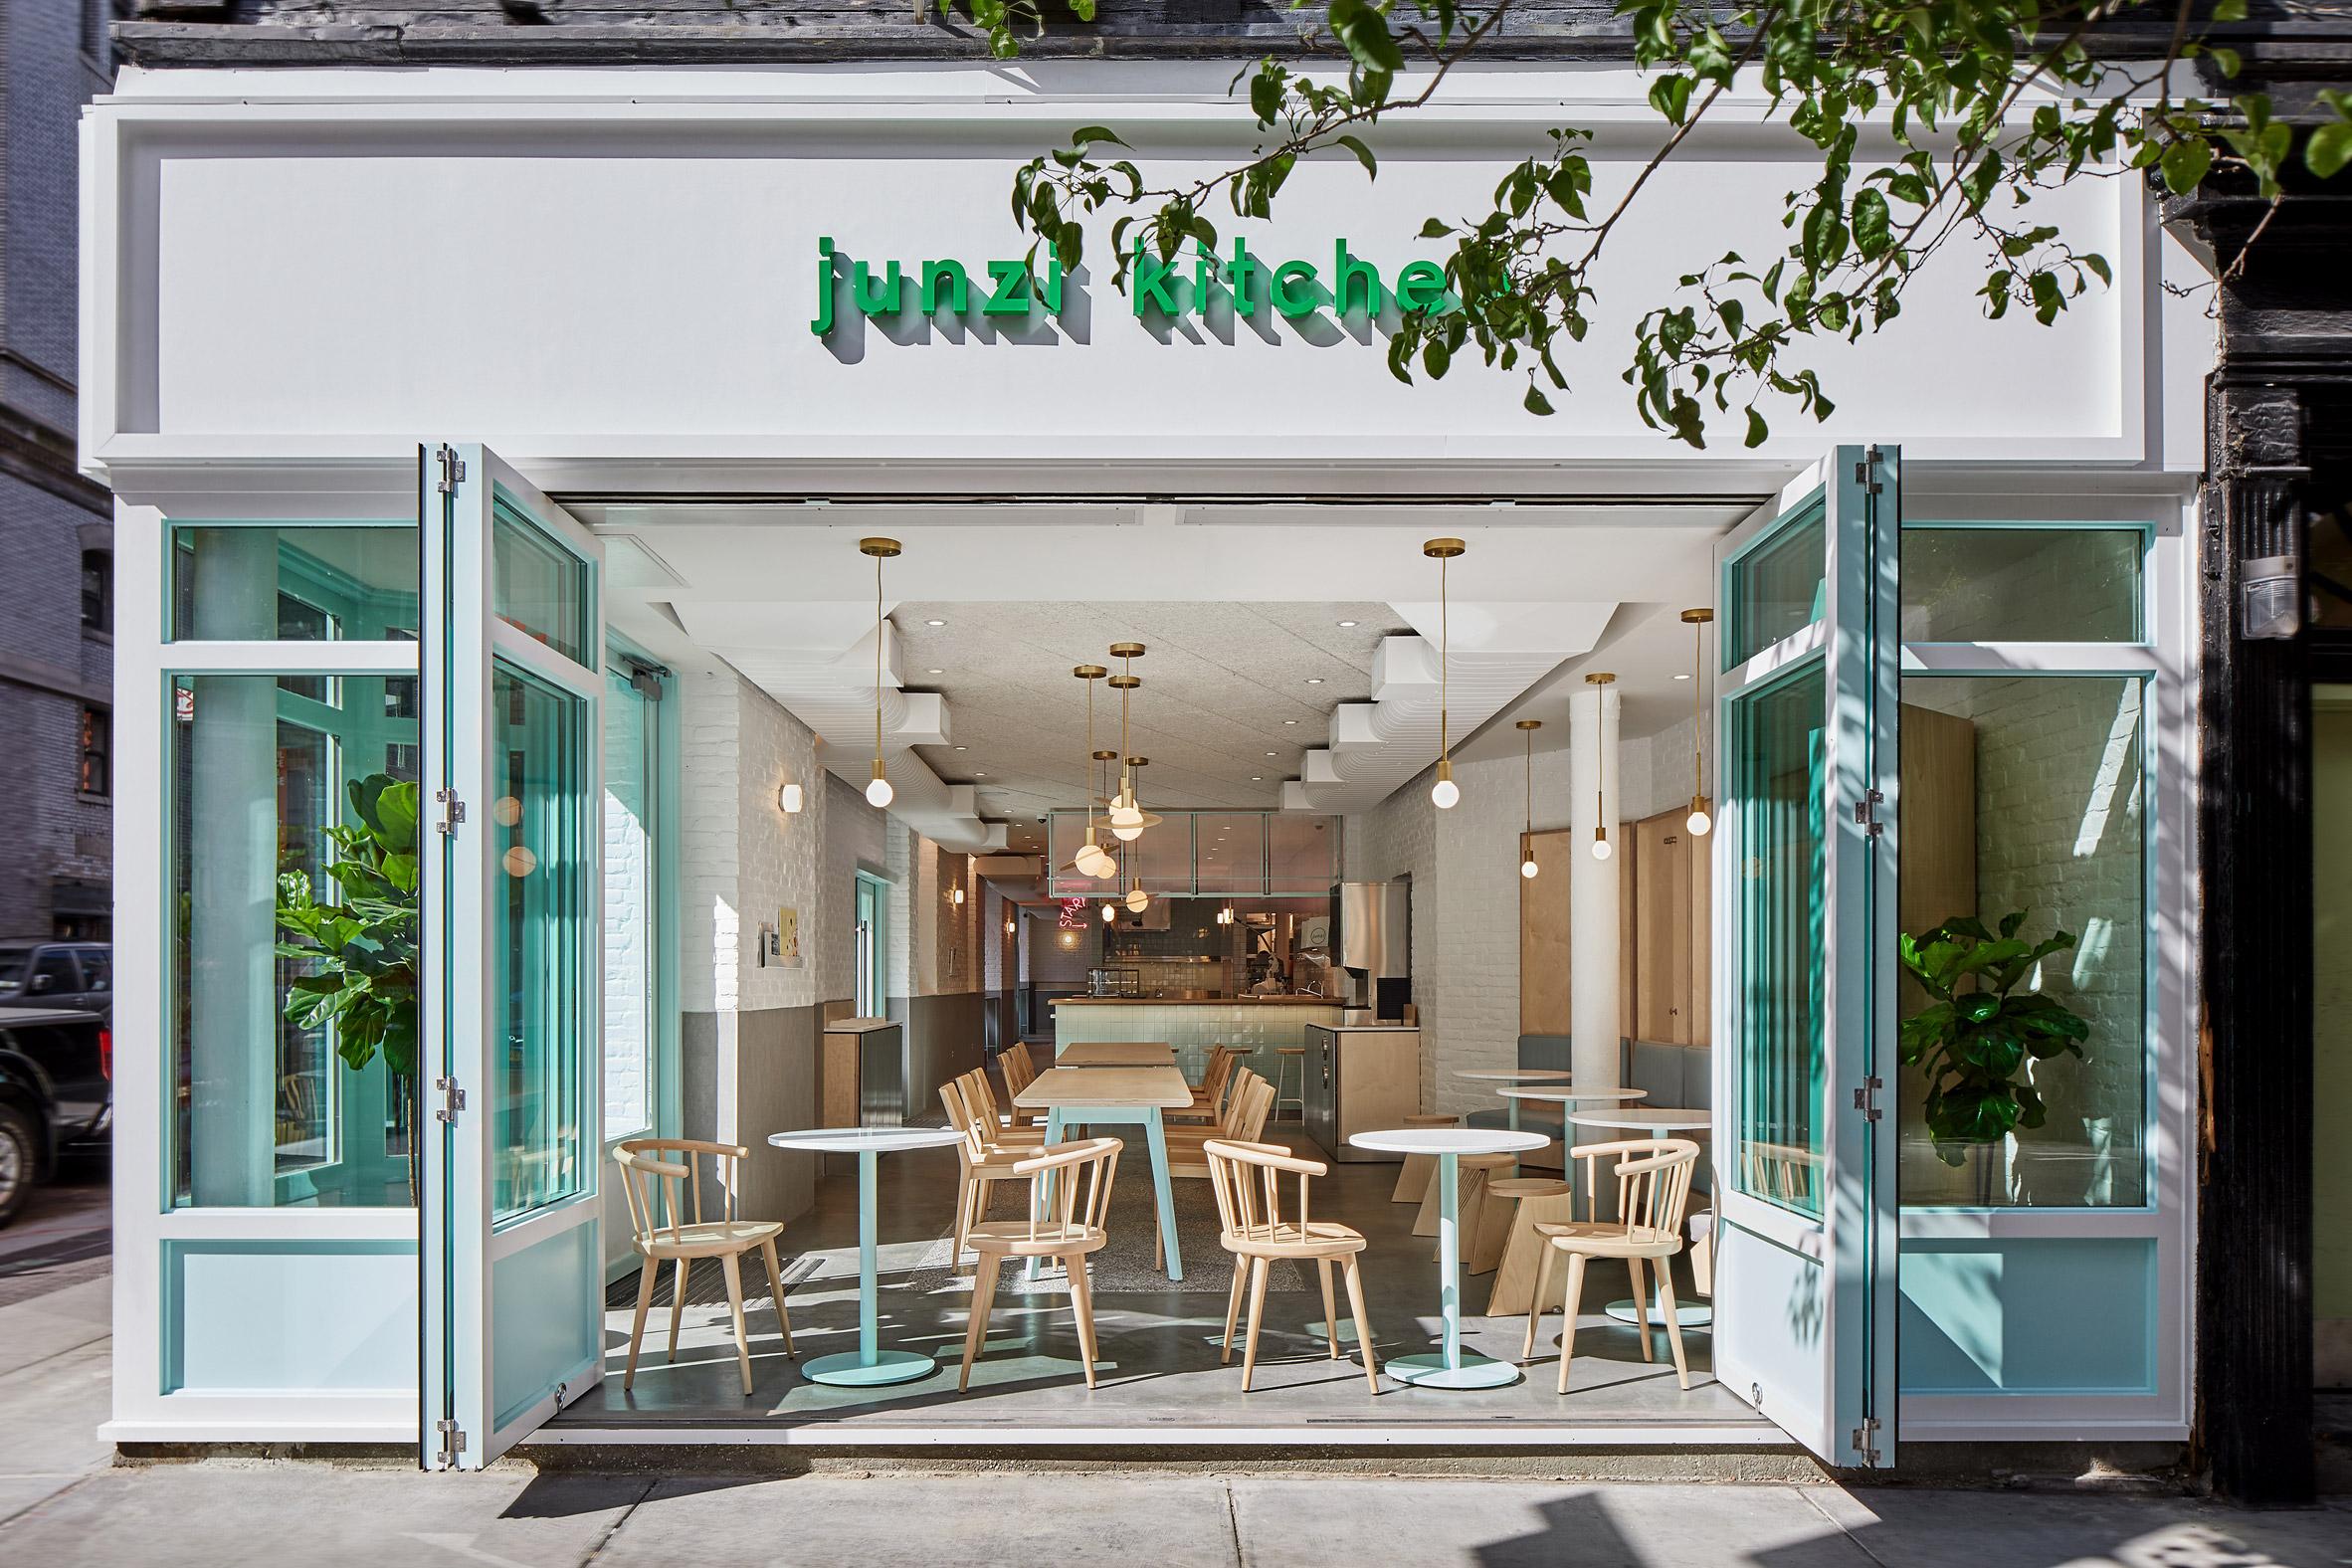 junzi-kitchen-xuhui-zhang-interiors-restaurant-new-york-city-usa_dezeen_2364_col_1.jpg